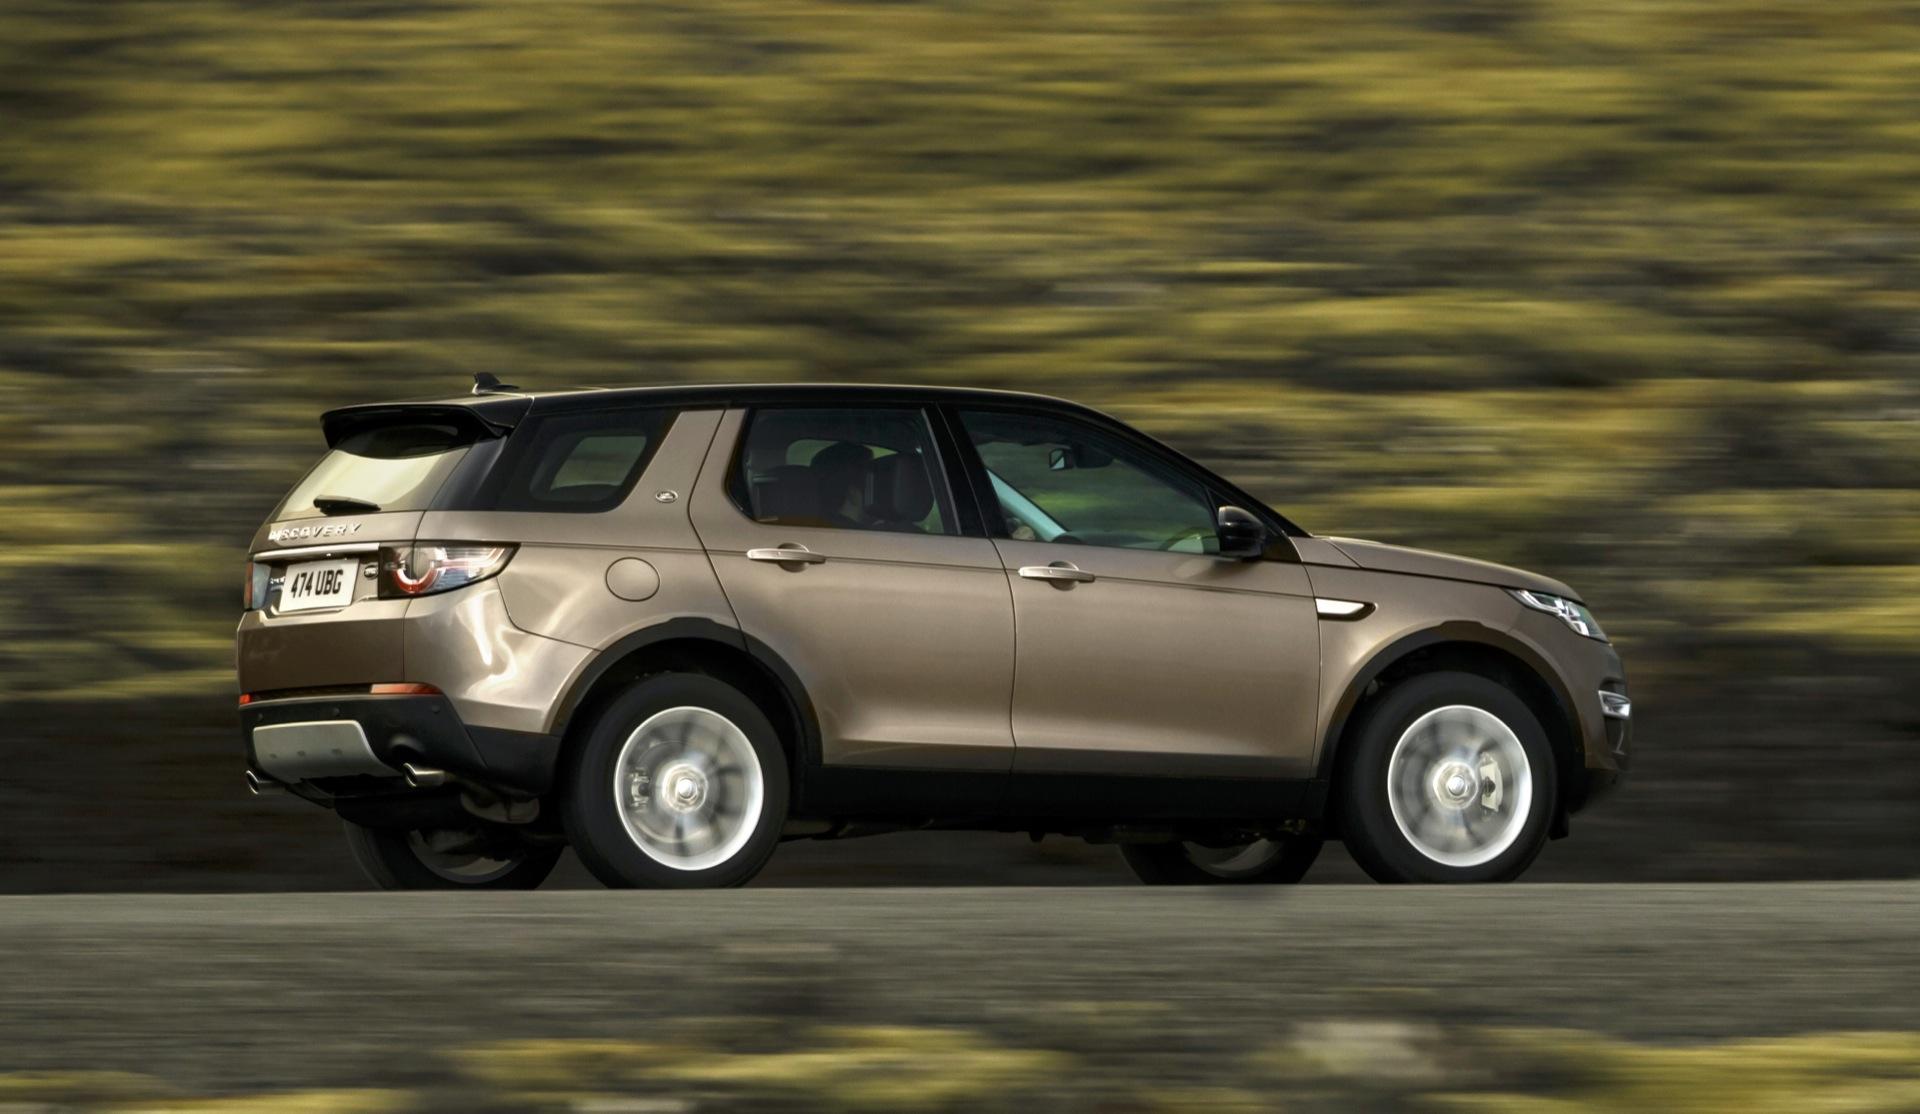 The Motoring World Honest John Awards Land Rover And Colorado Blower Motor Wiring Diagram